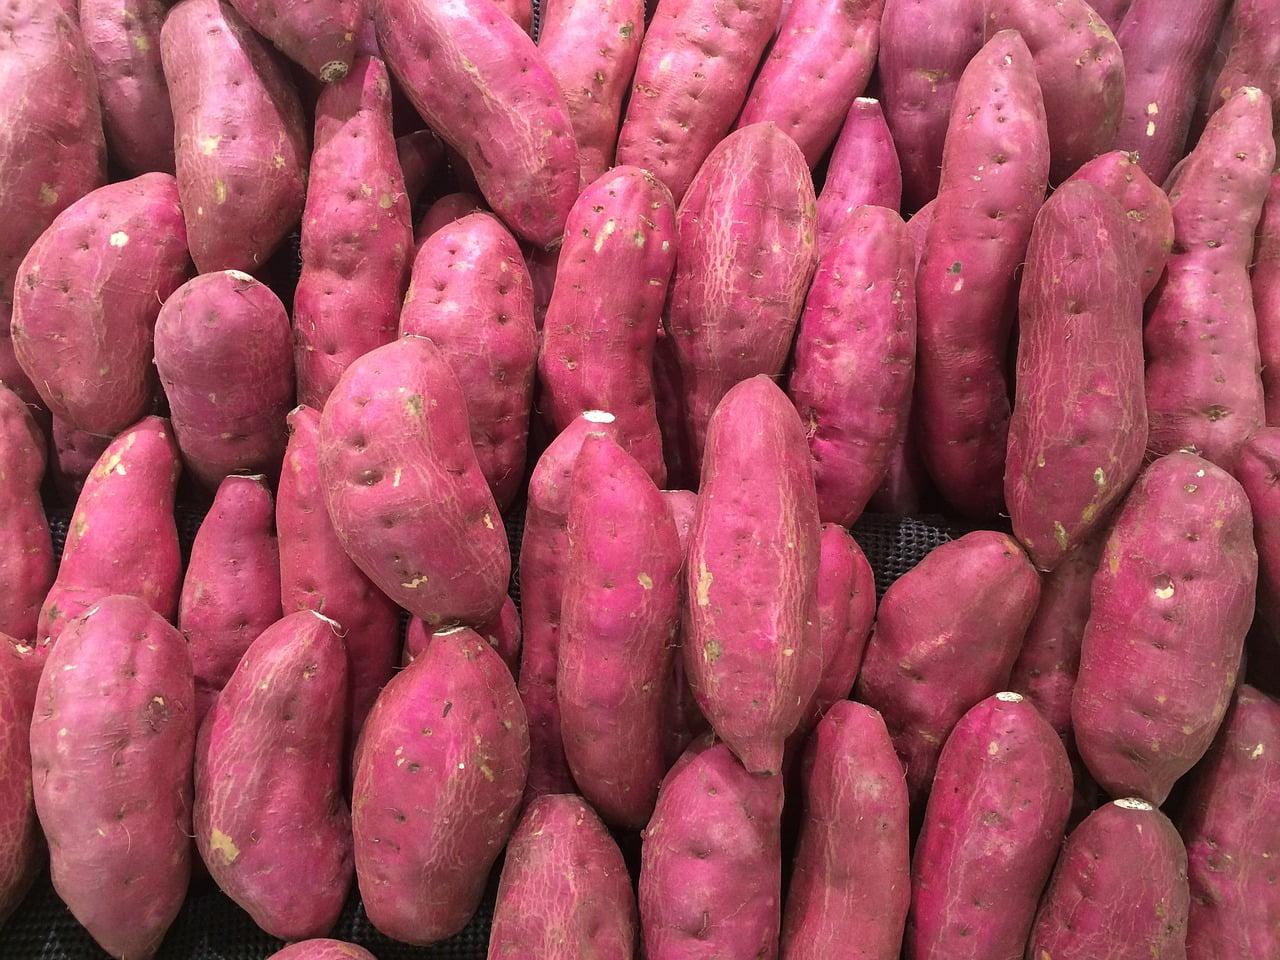 Sweet Potato.Photo by Mike Beauregard/Flickr